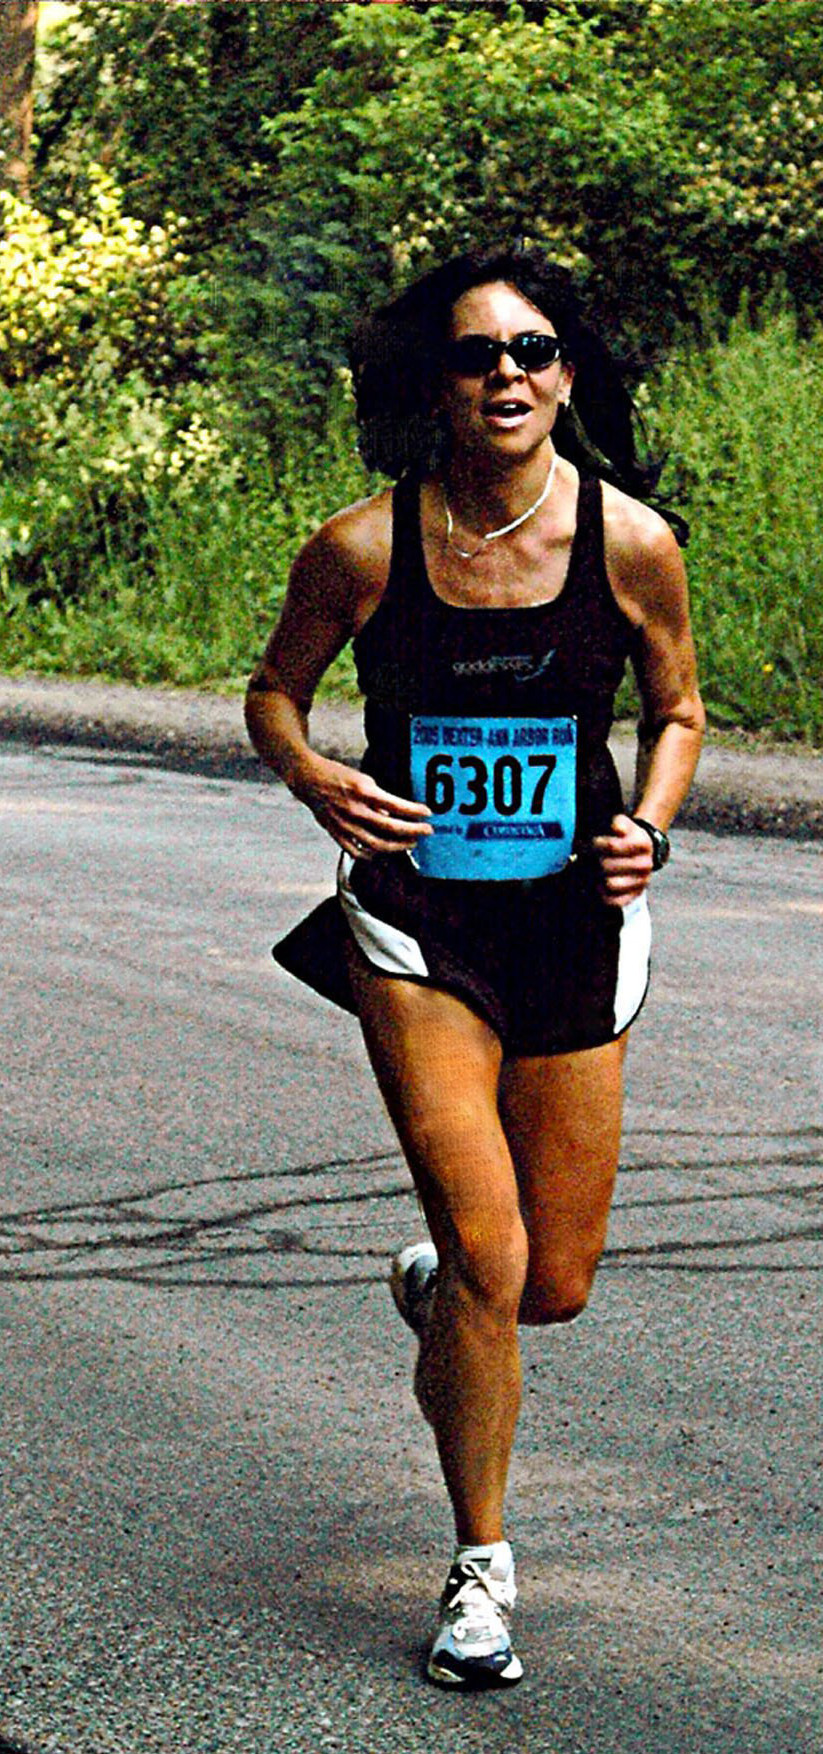 Runnin' Woman.jpg